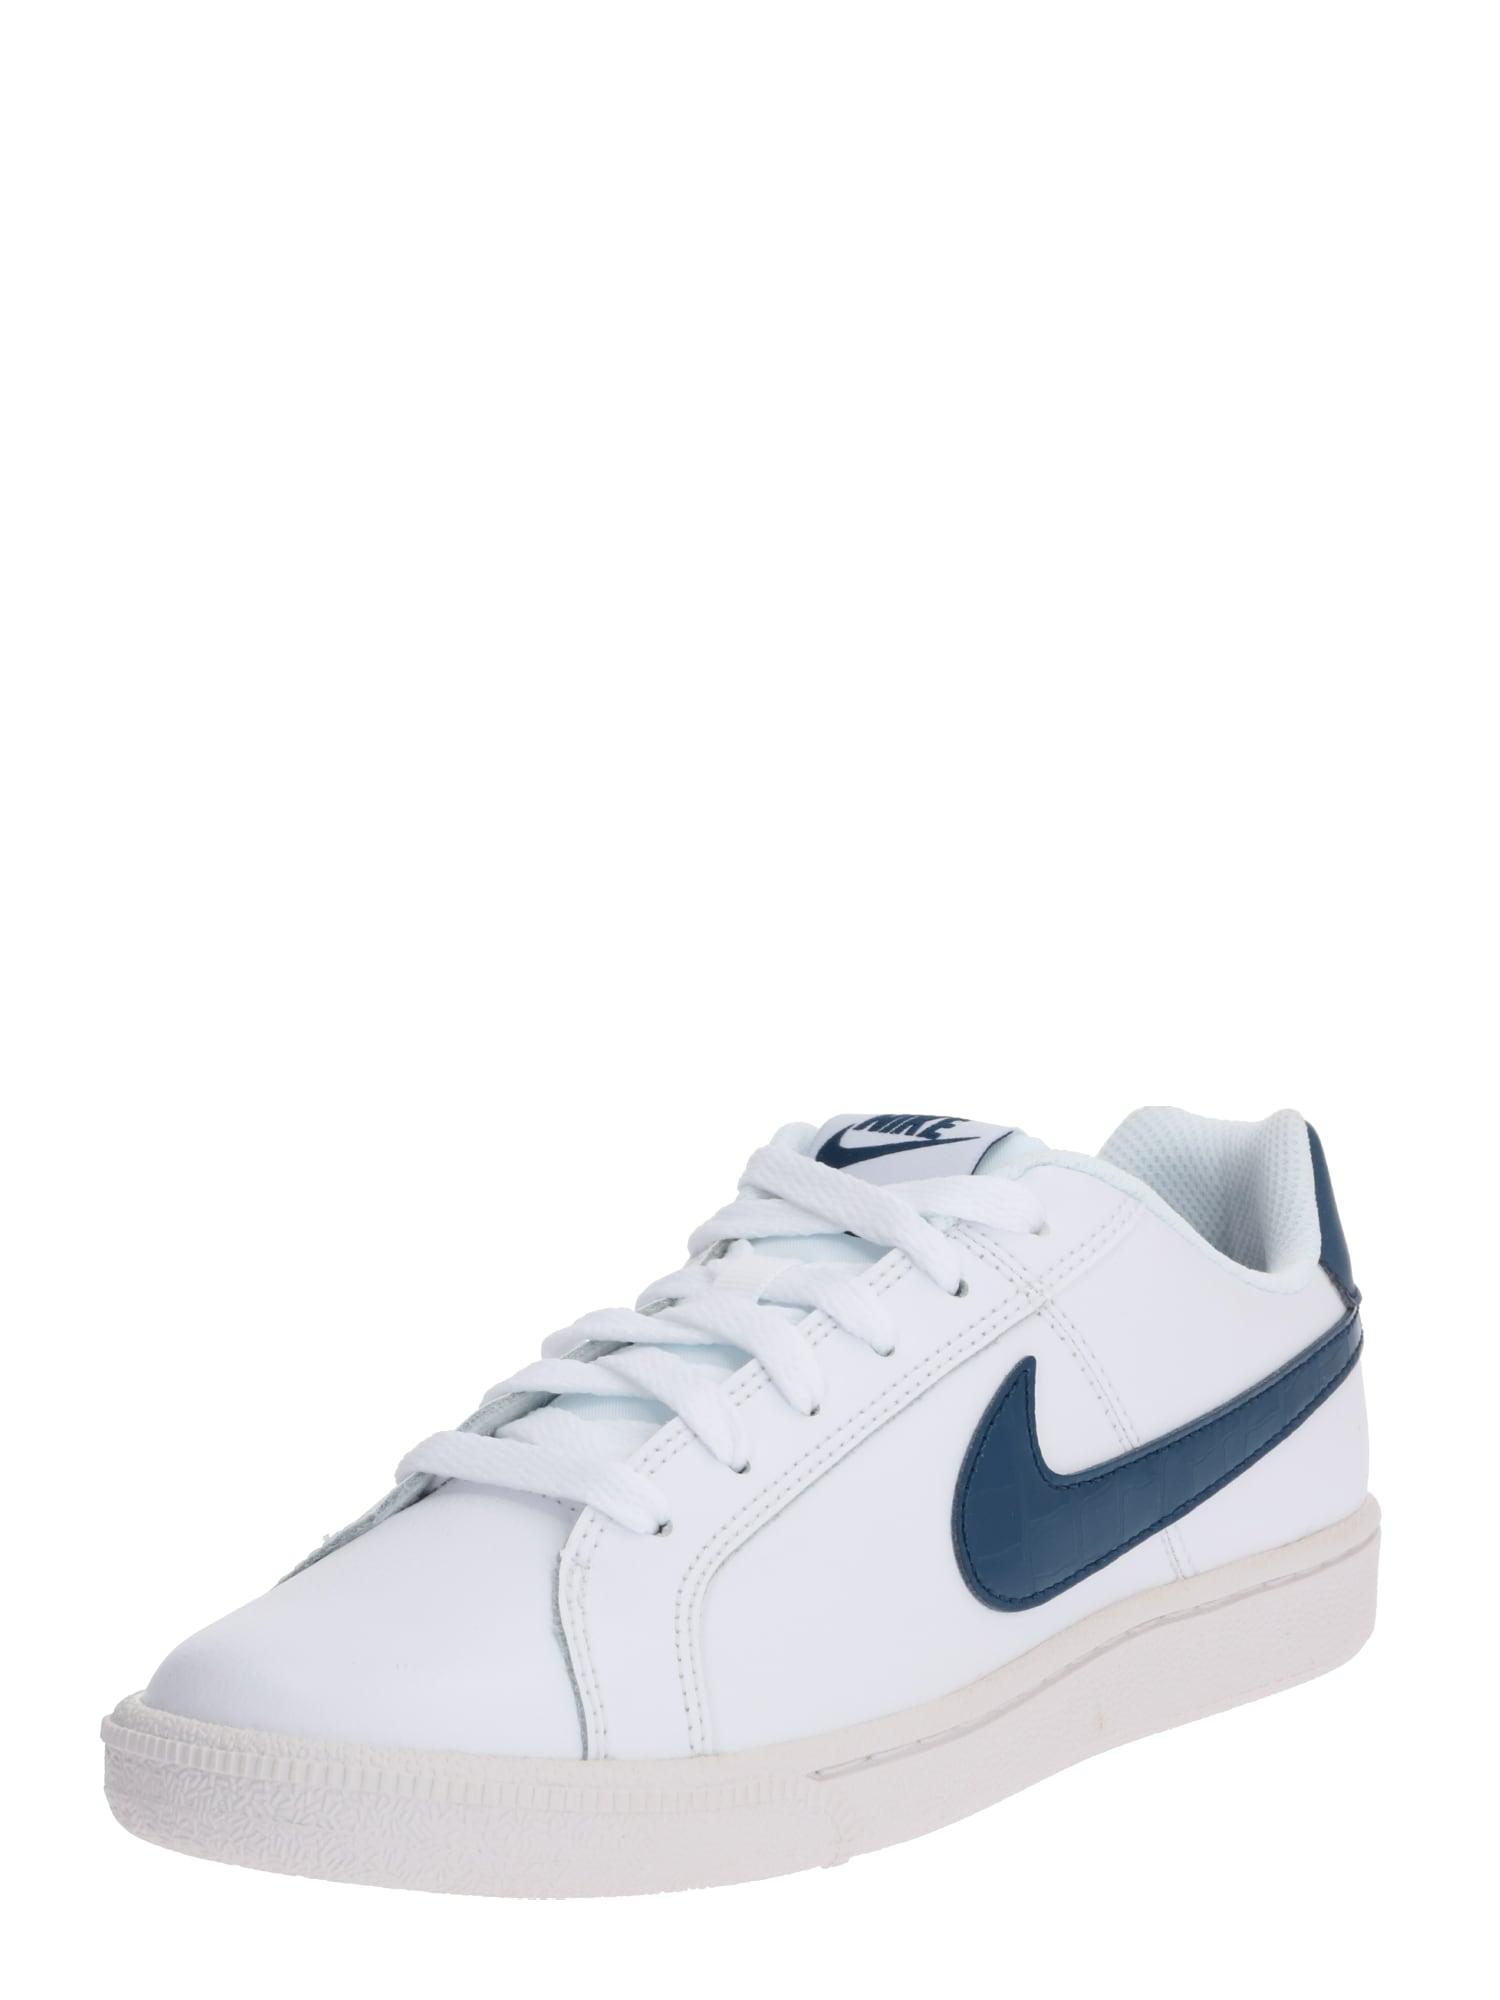 Nike Sportswear Sportbačiai be auliuko 'Court Royale' balta / tamsiai mėlyna